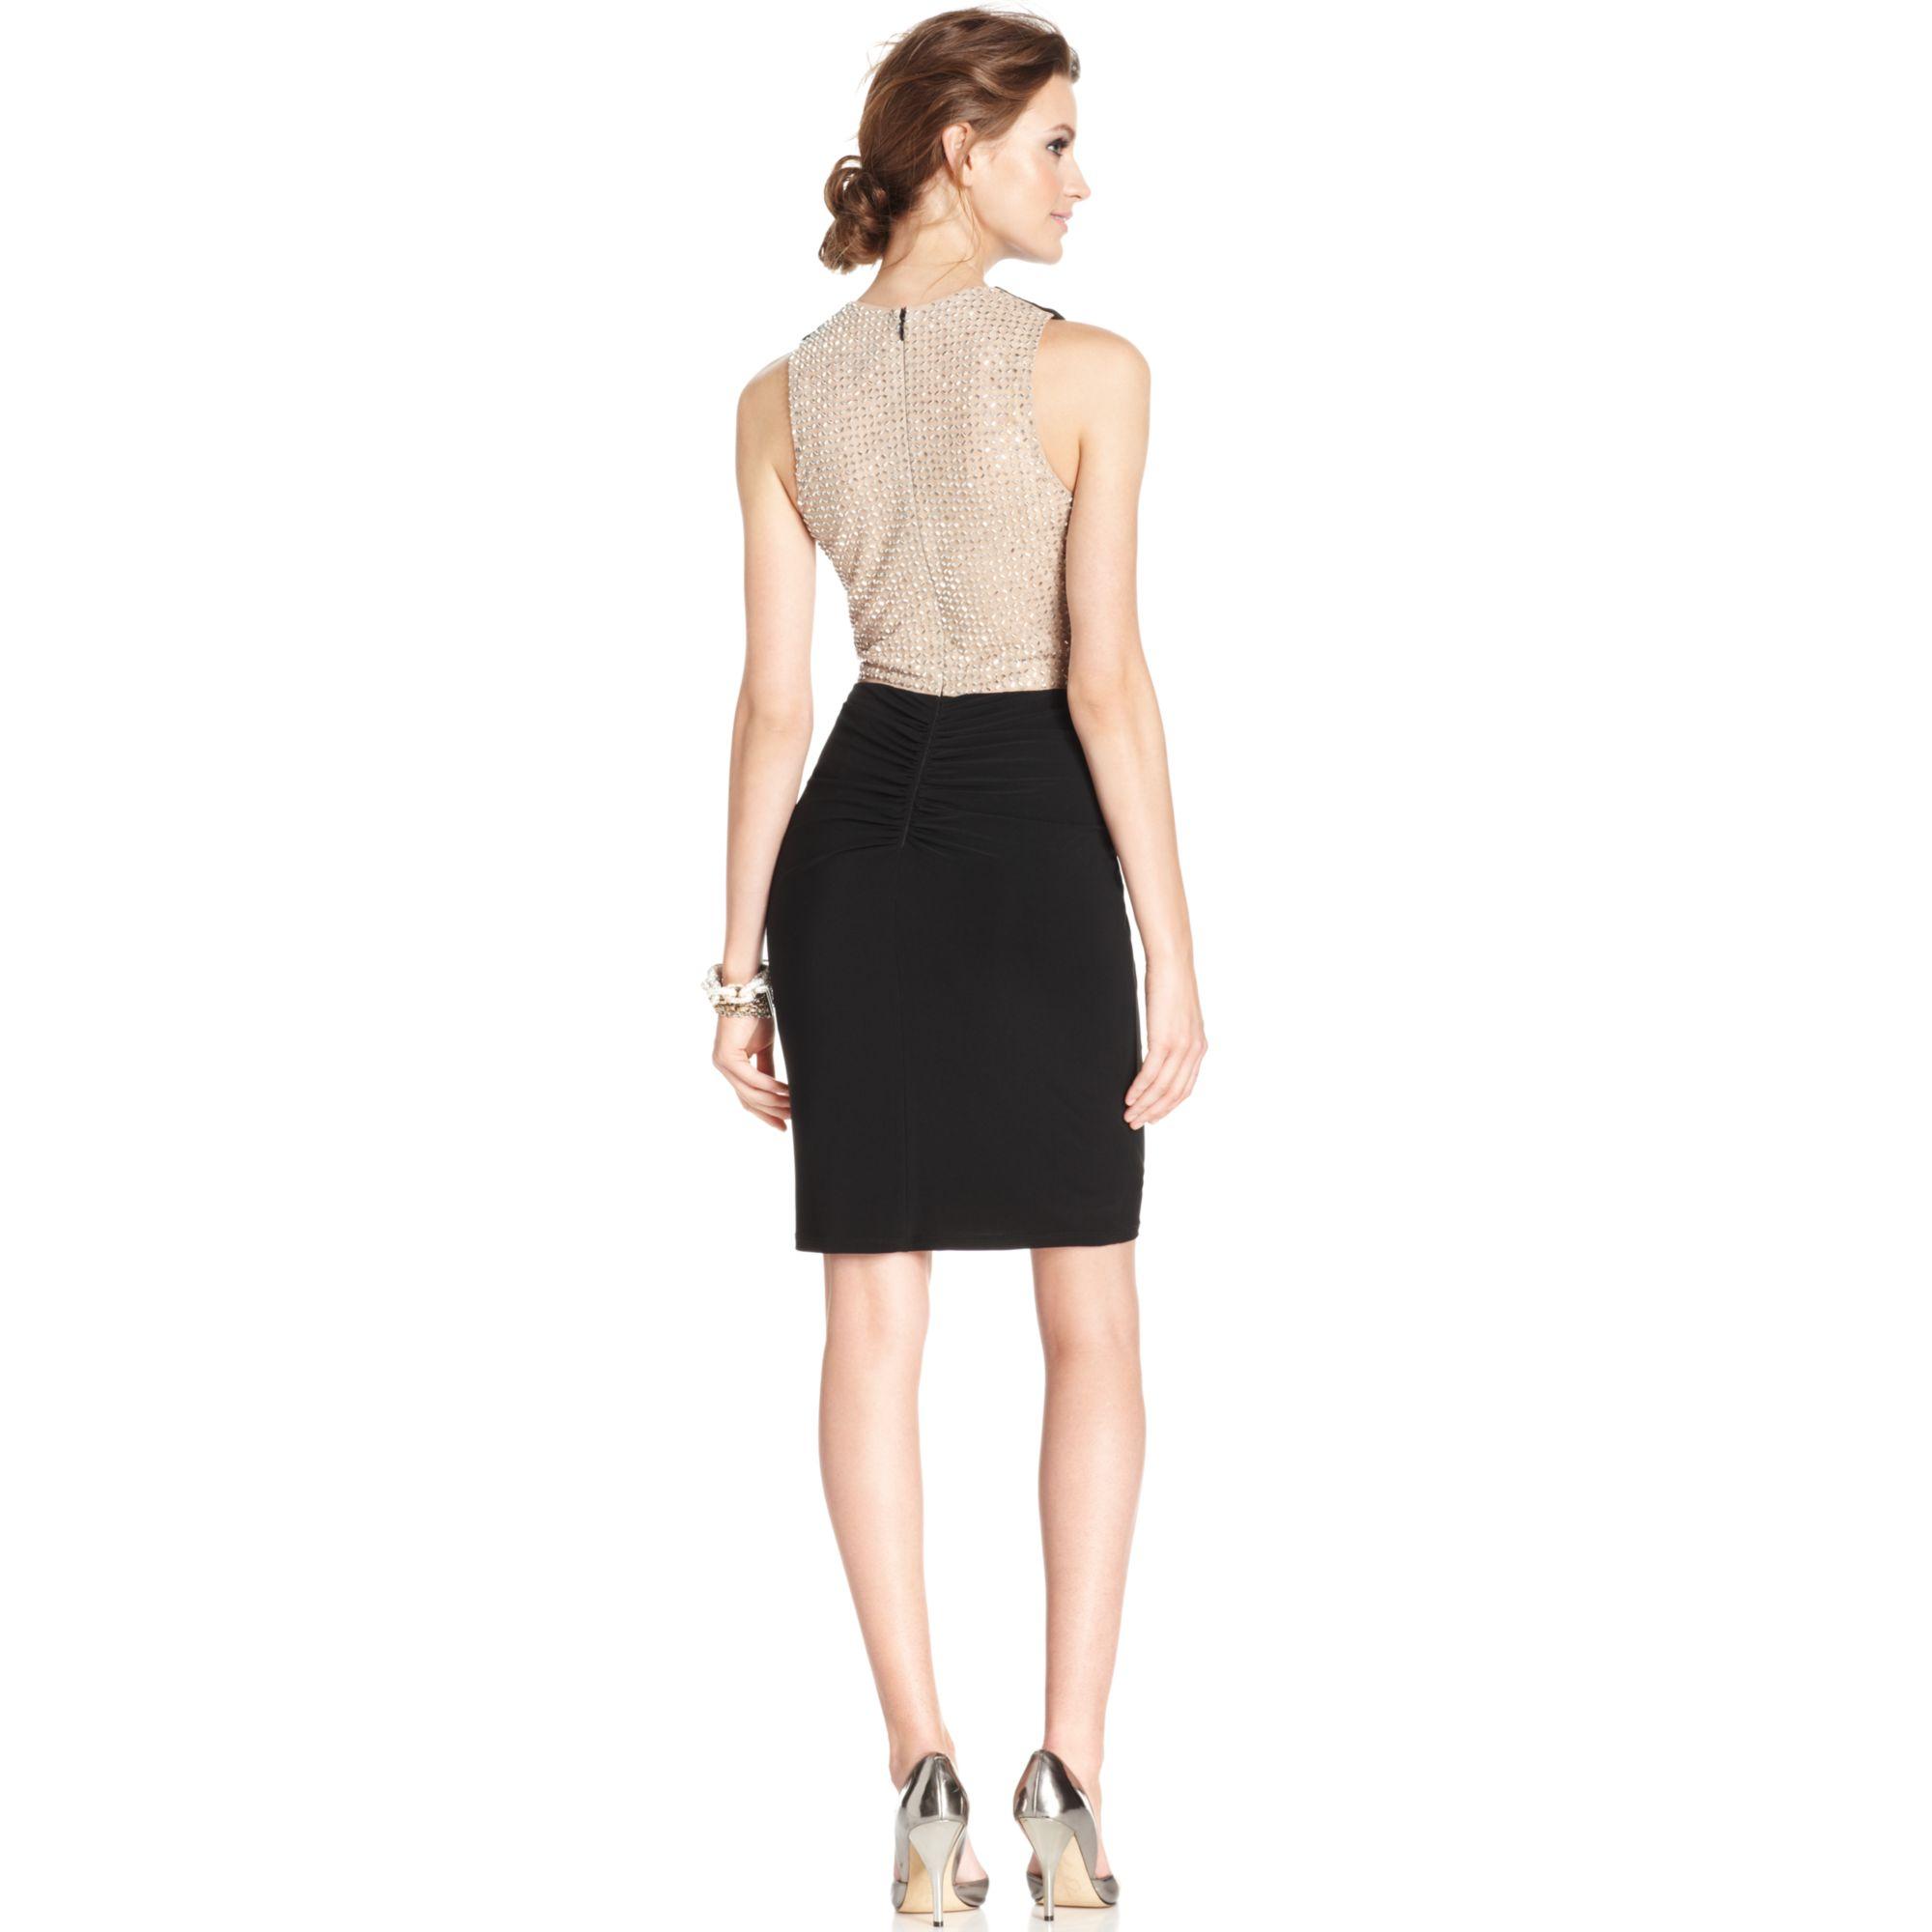 Xscape Beaded Dress